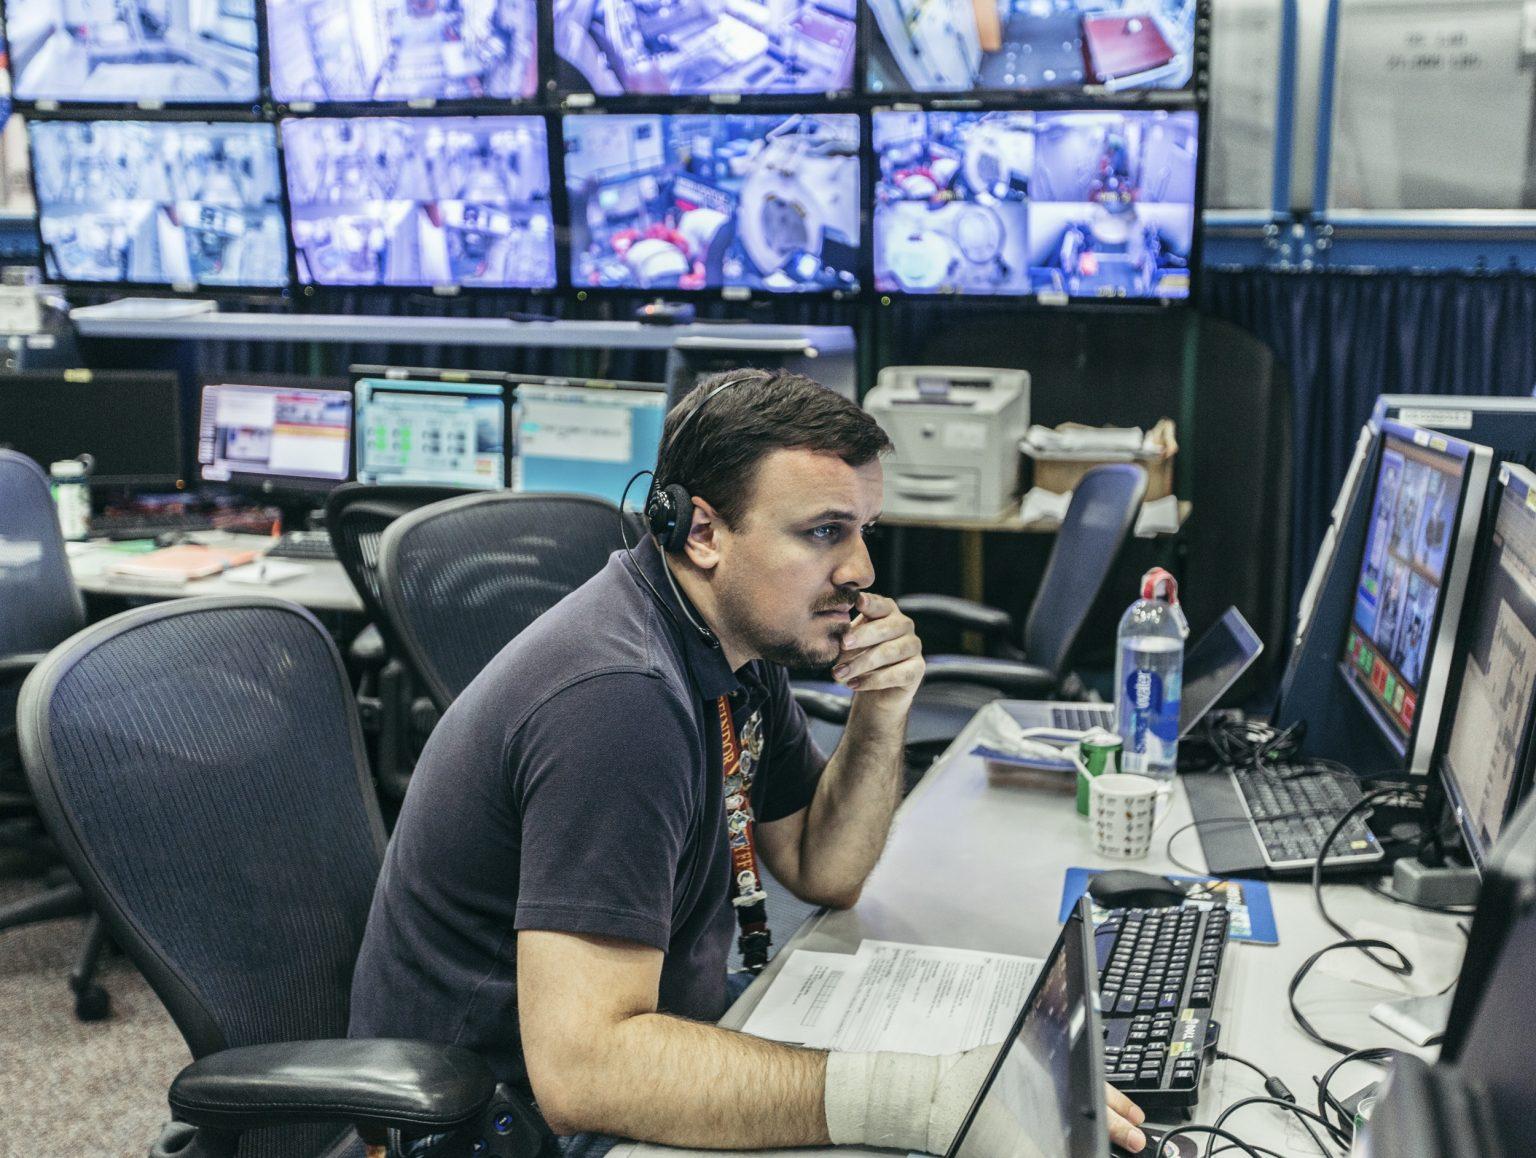 A supervisor during an ISS simulation training.  NASA Johnson Space Center, Houston, Texas, USA, 2018